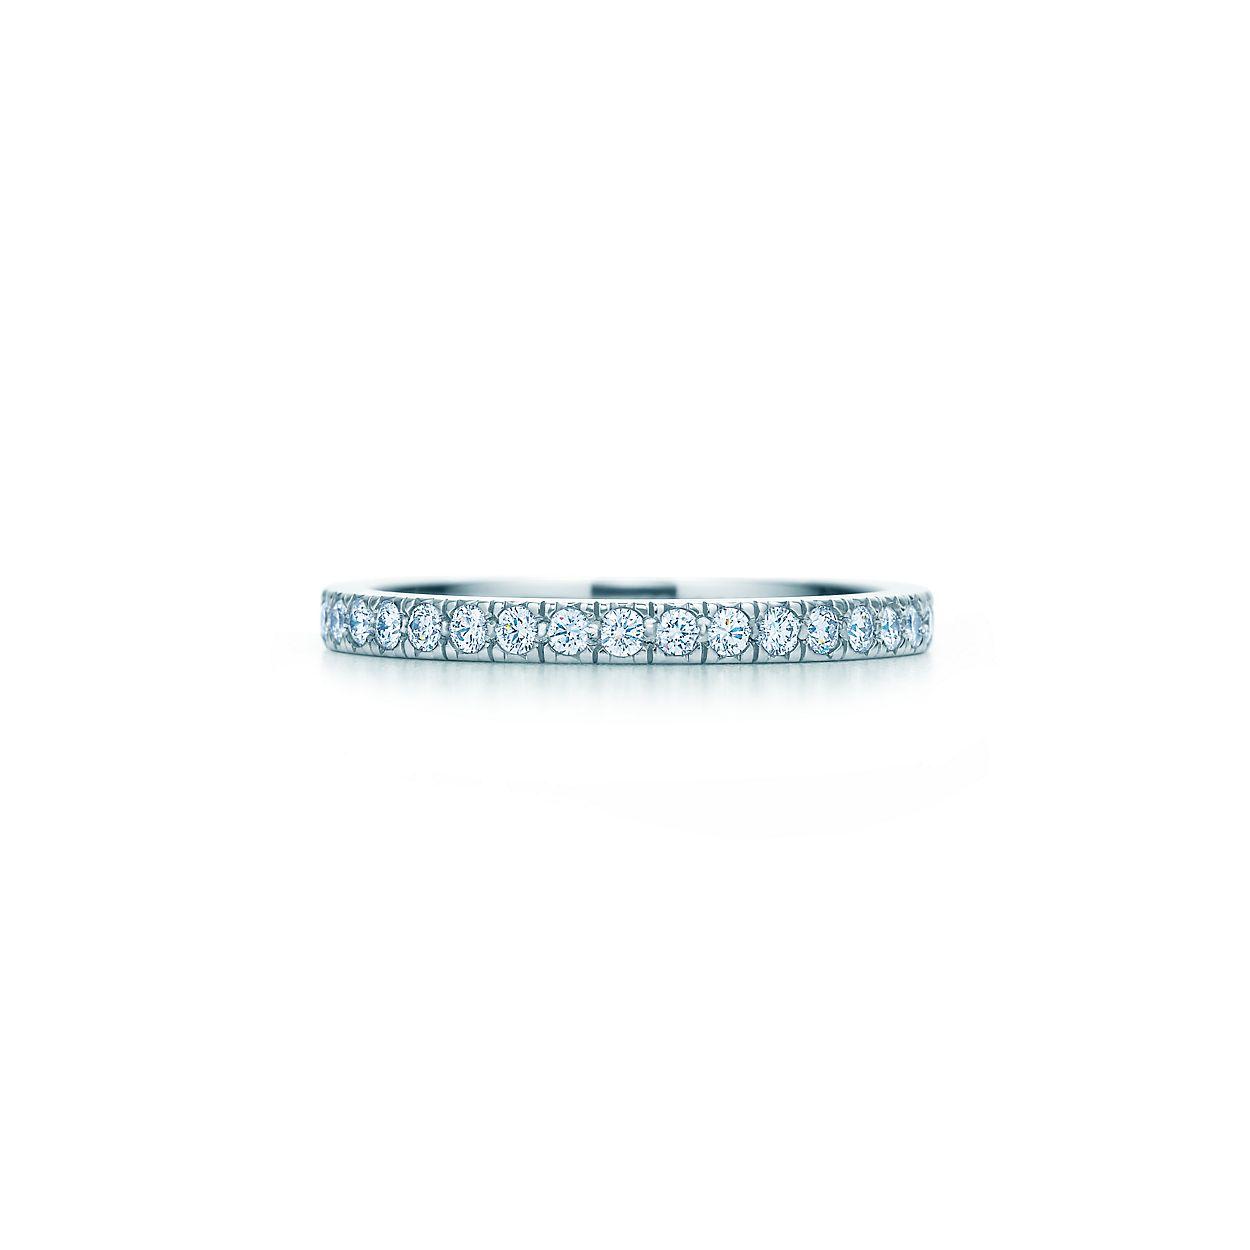 Tiffany Novo Band Ring With Diamonds In Platinum Co Mobile Legend Diamond 36